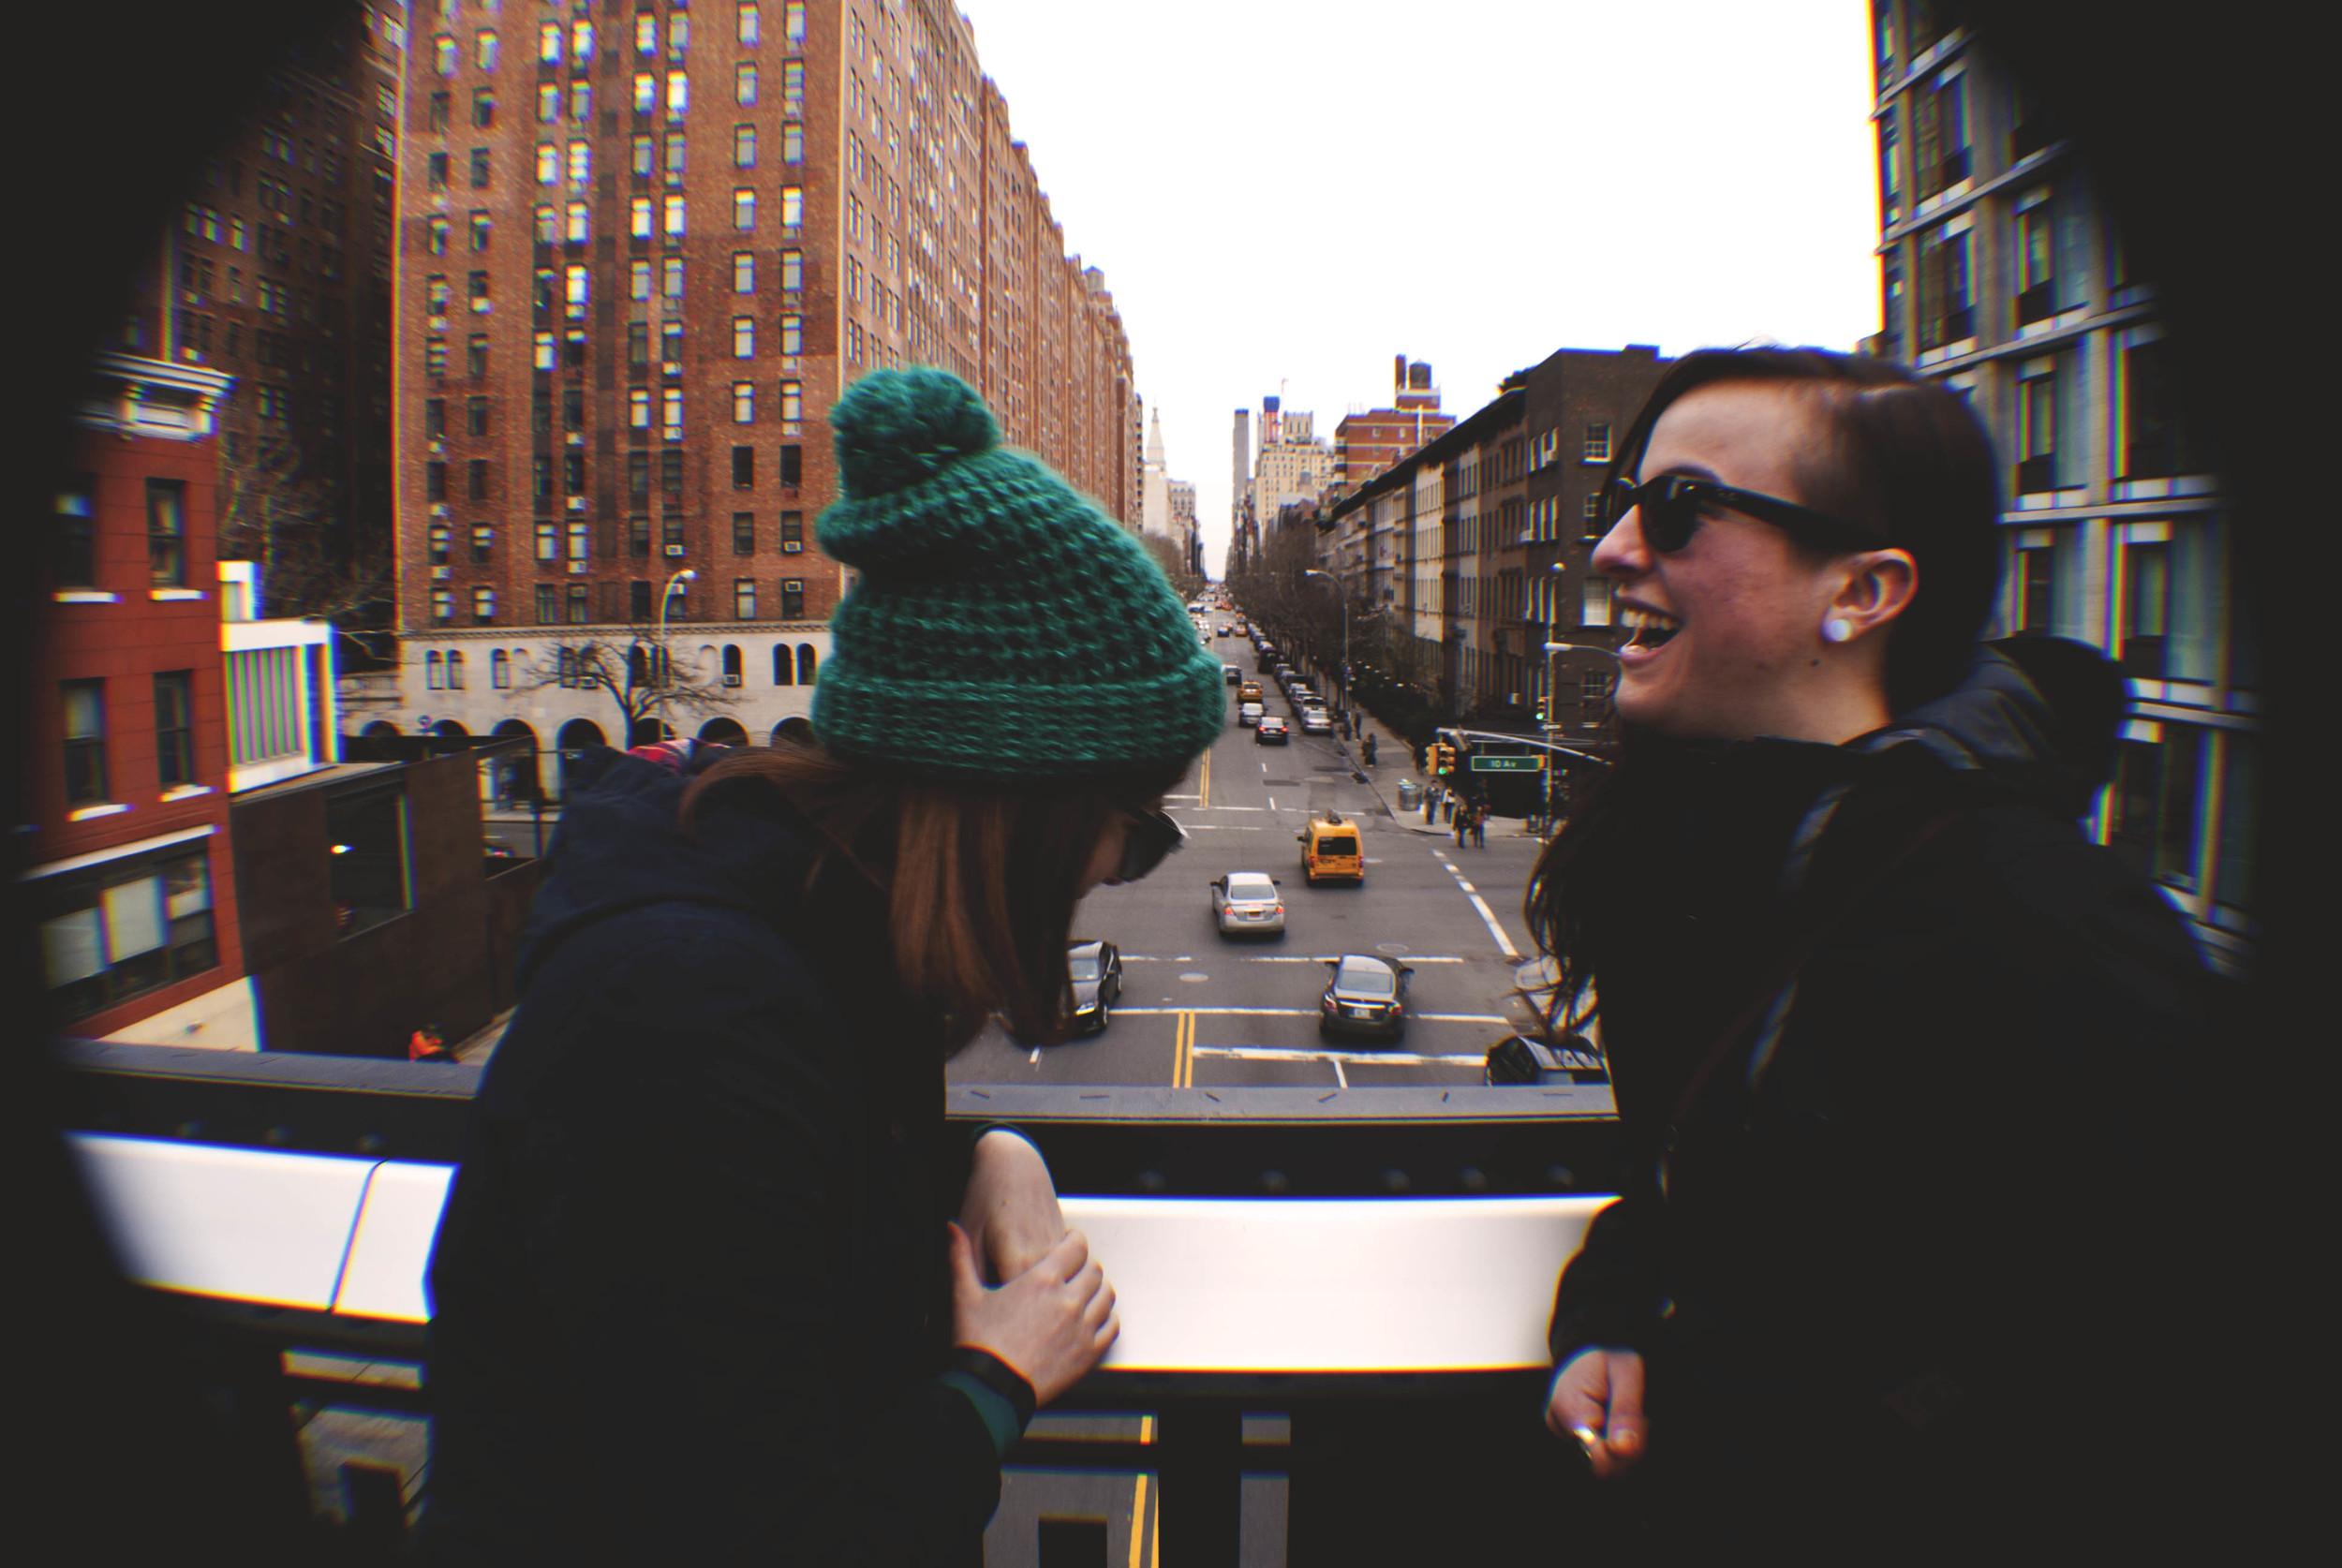 NYC031.jpg